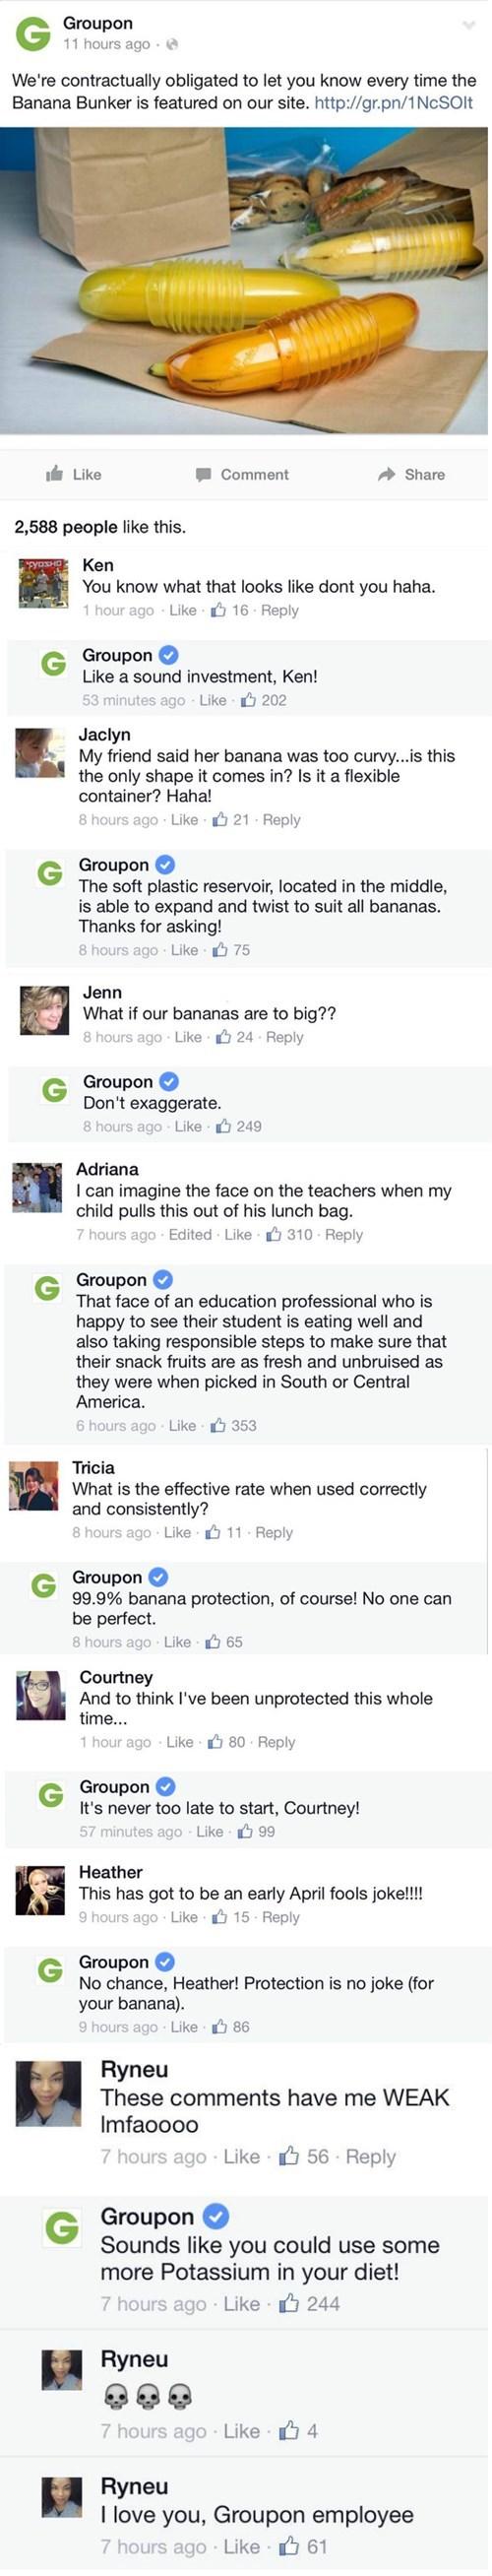 funny-facebook-pic-groupon-banana-case